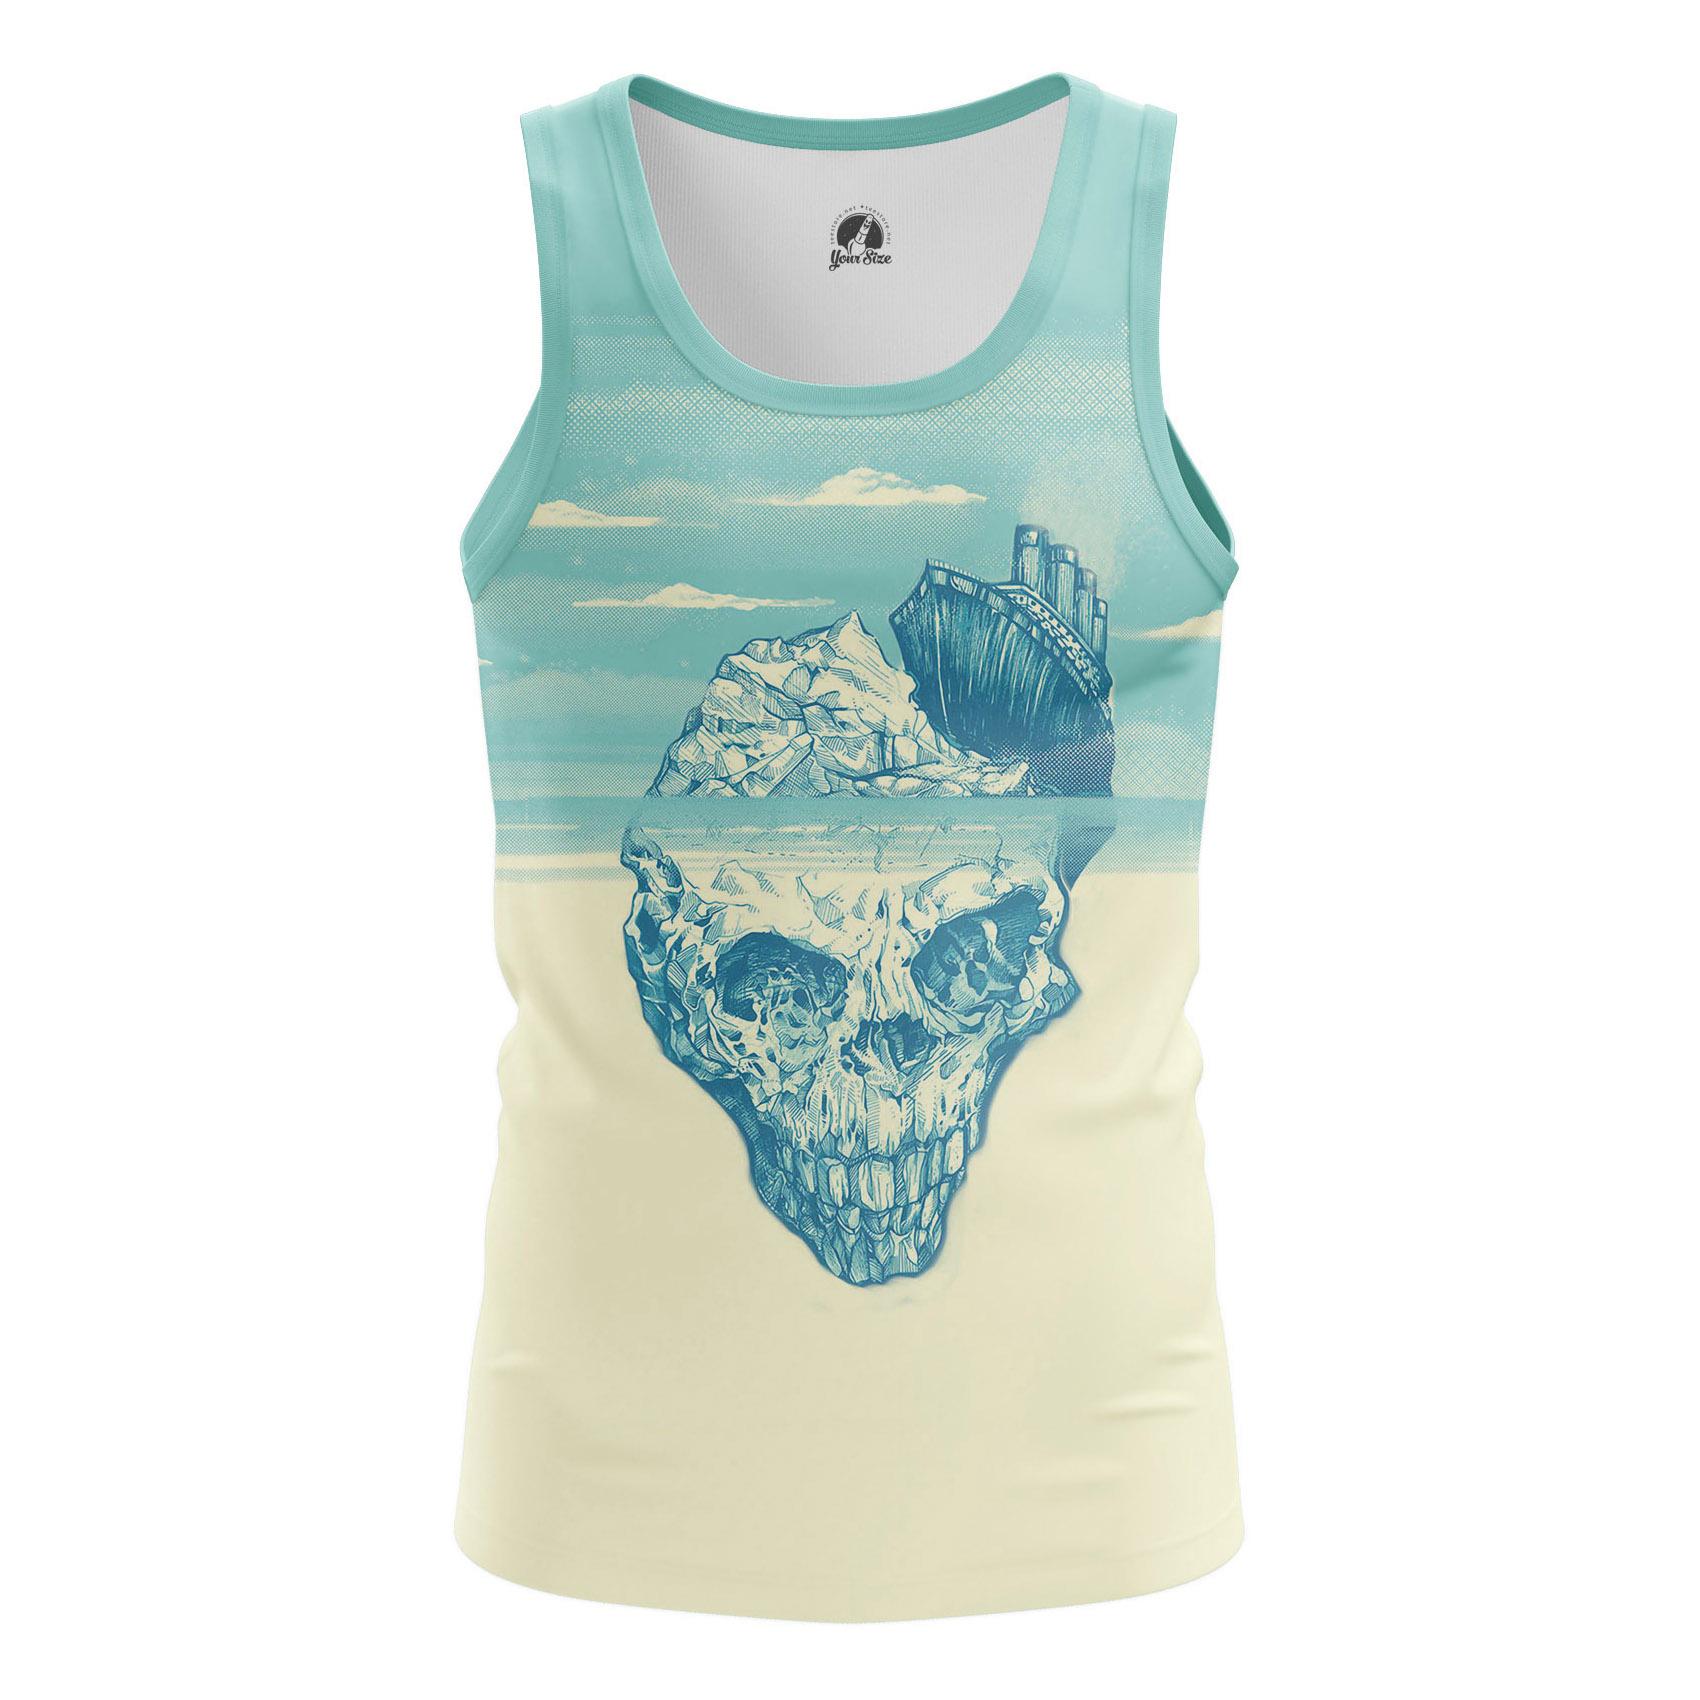 M-Tan-Iceberg_1482275345_327